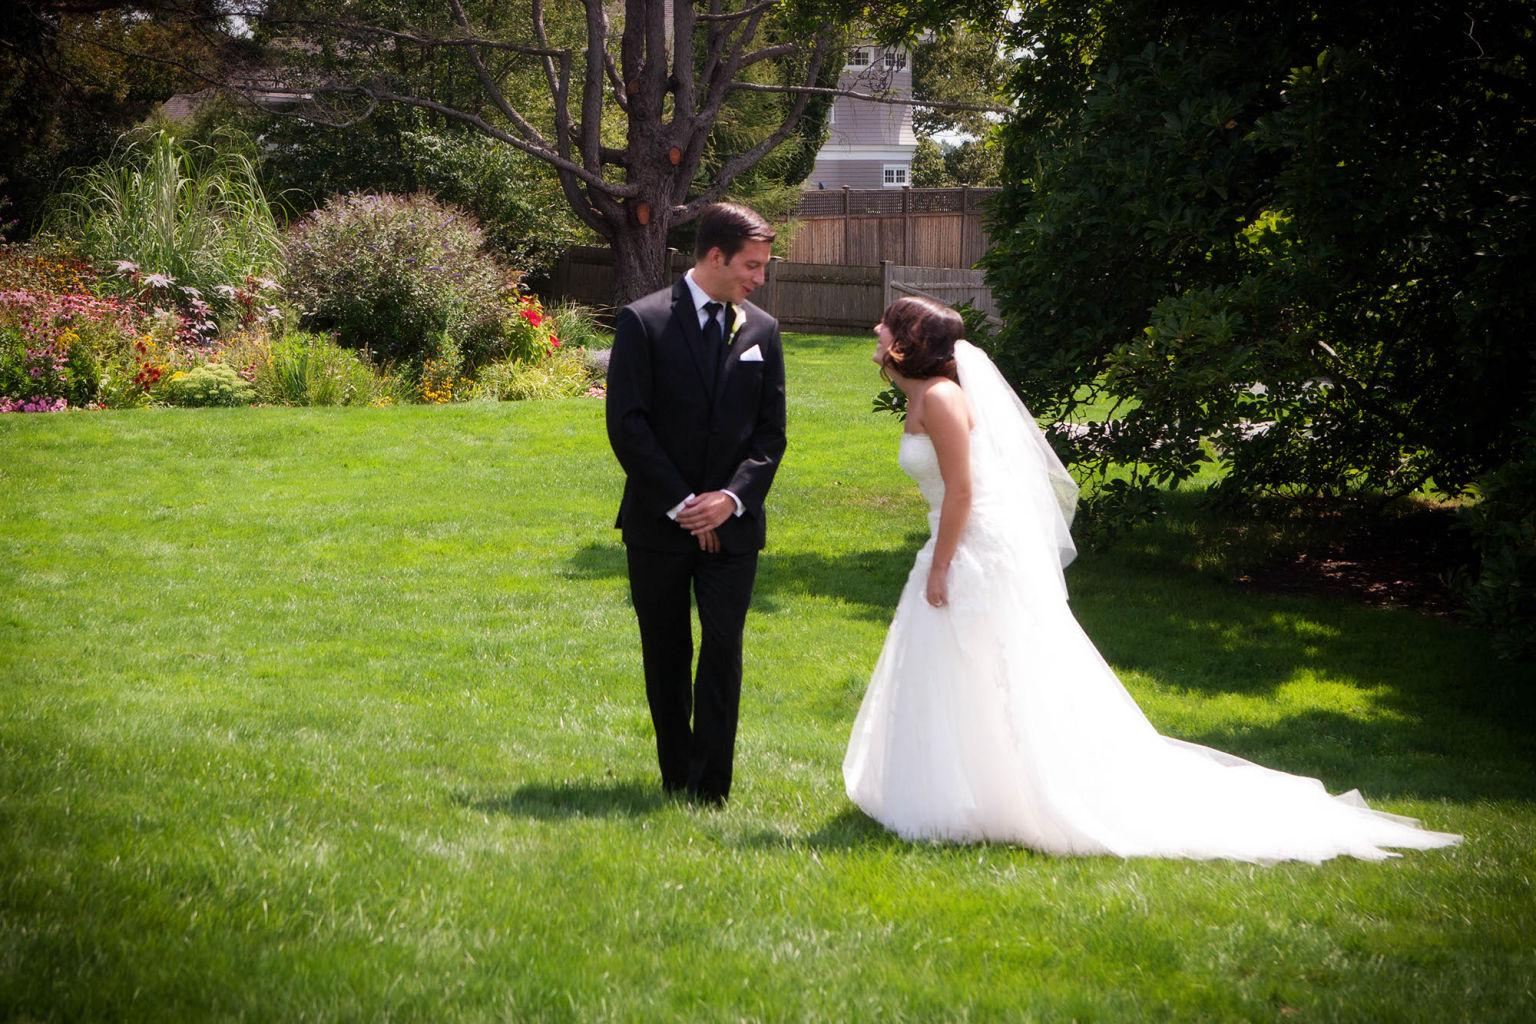 Wentworth-weddings-123LaurenMike-1144 A